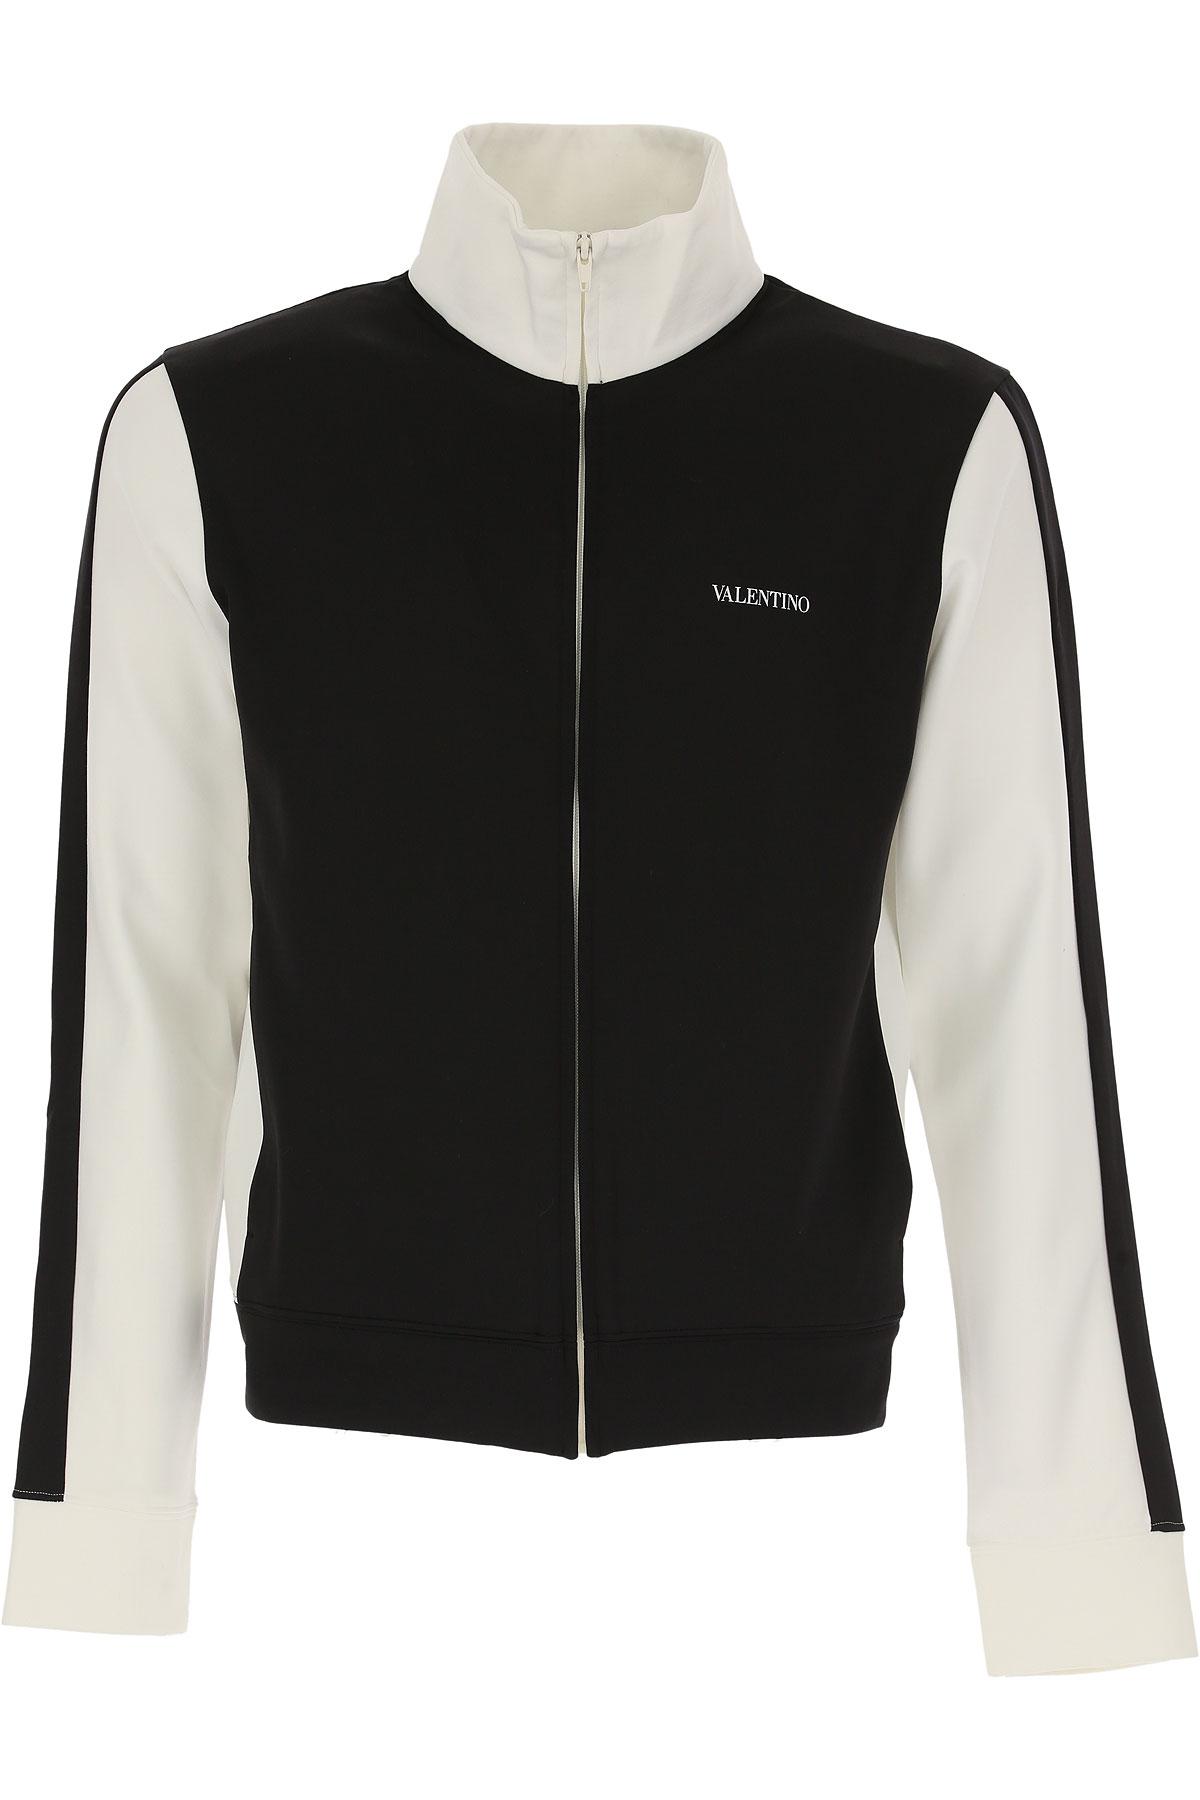 Valentino Sweatshirt for Men, Black, polyamide, 2017, L XL USA-472832